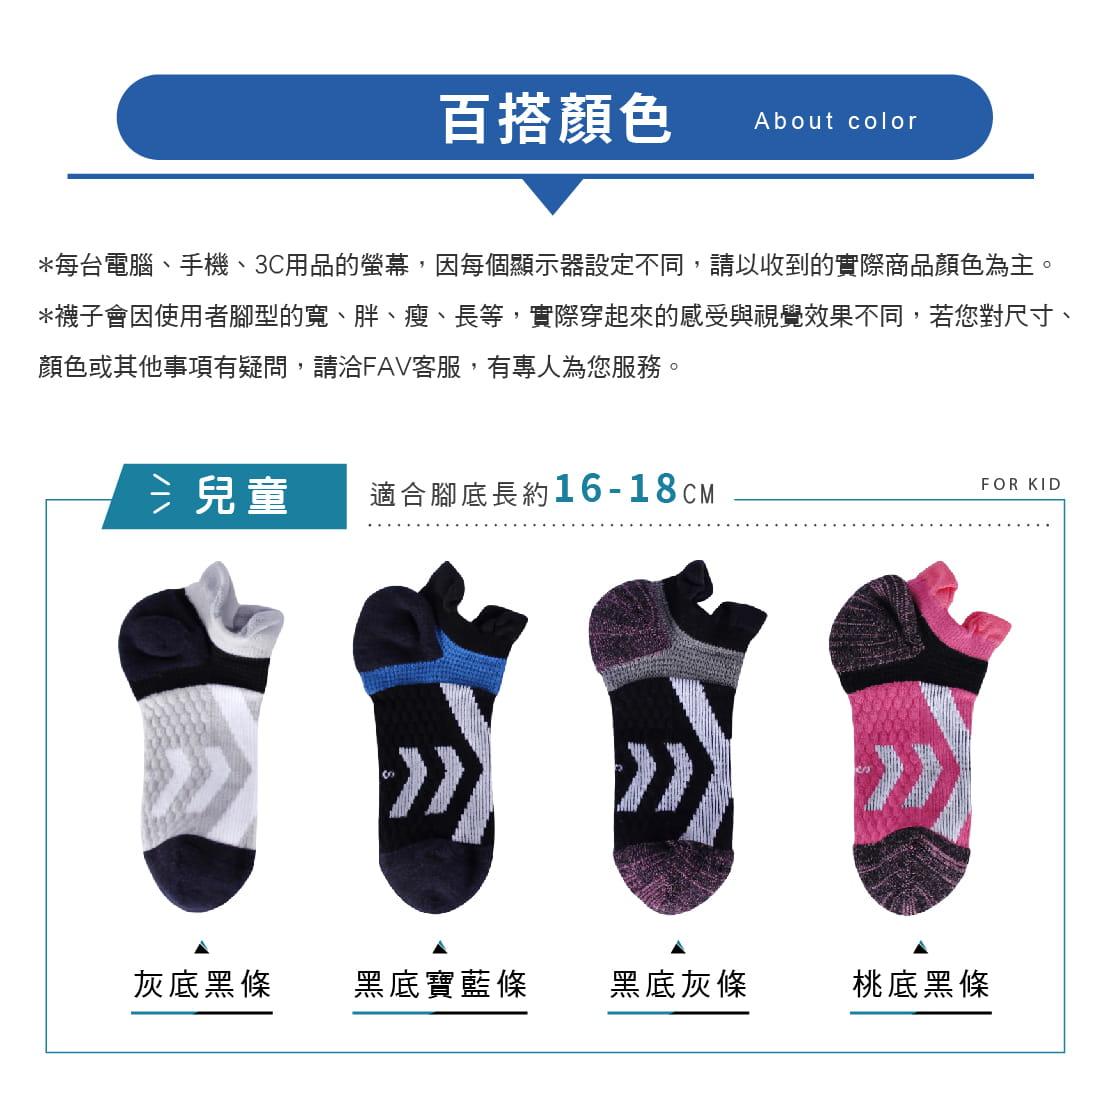 【FAV】足弓X型防護兒童運動襪(無止滑) 6